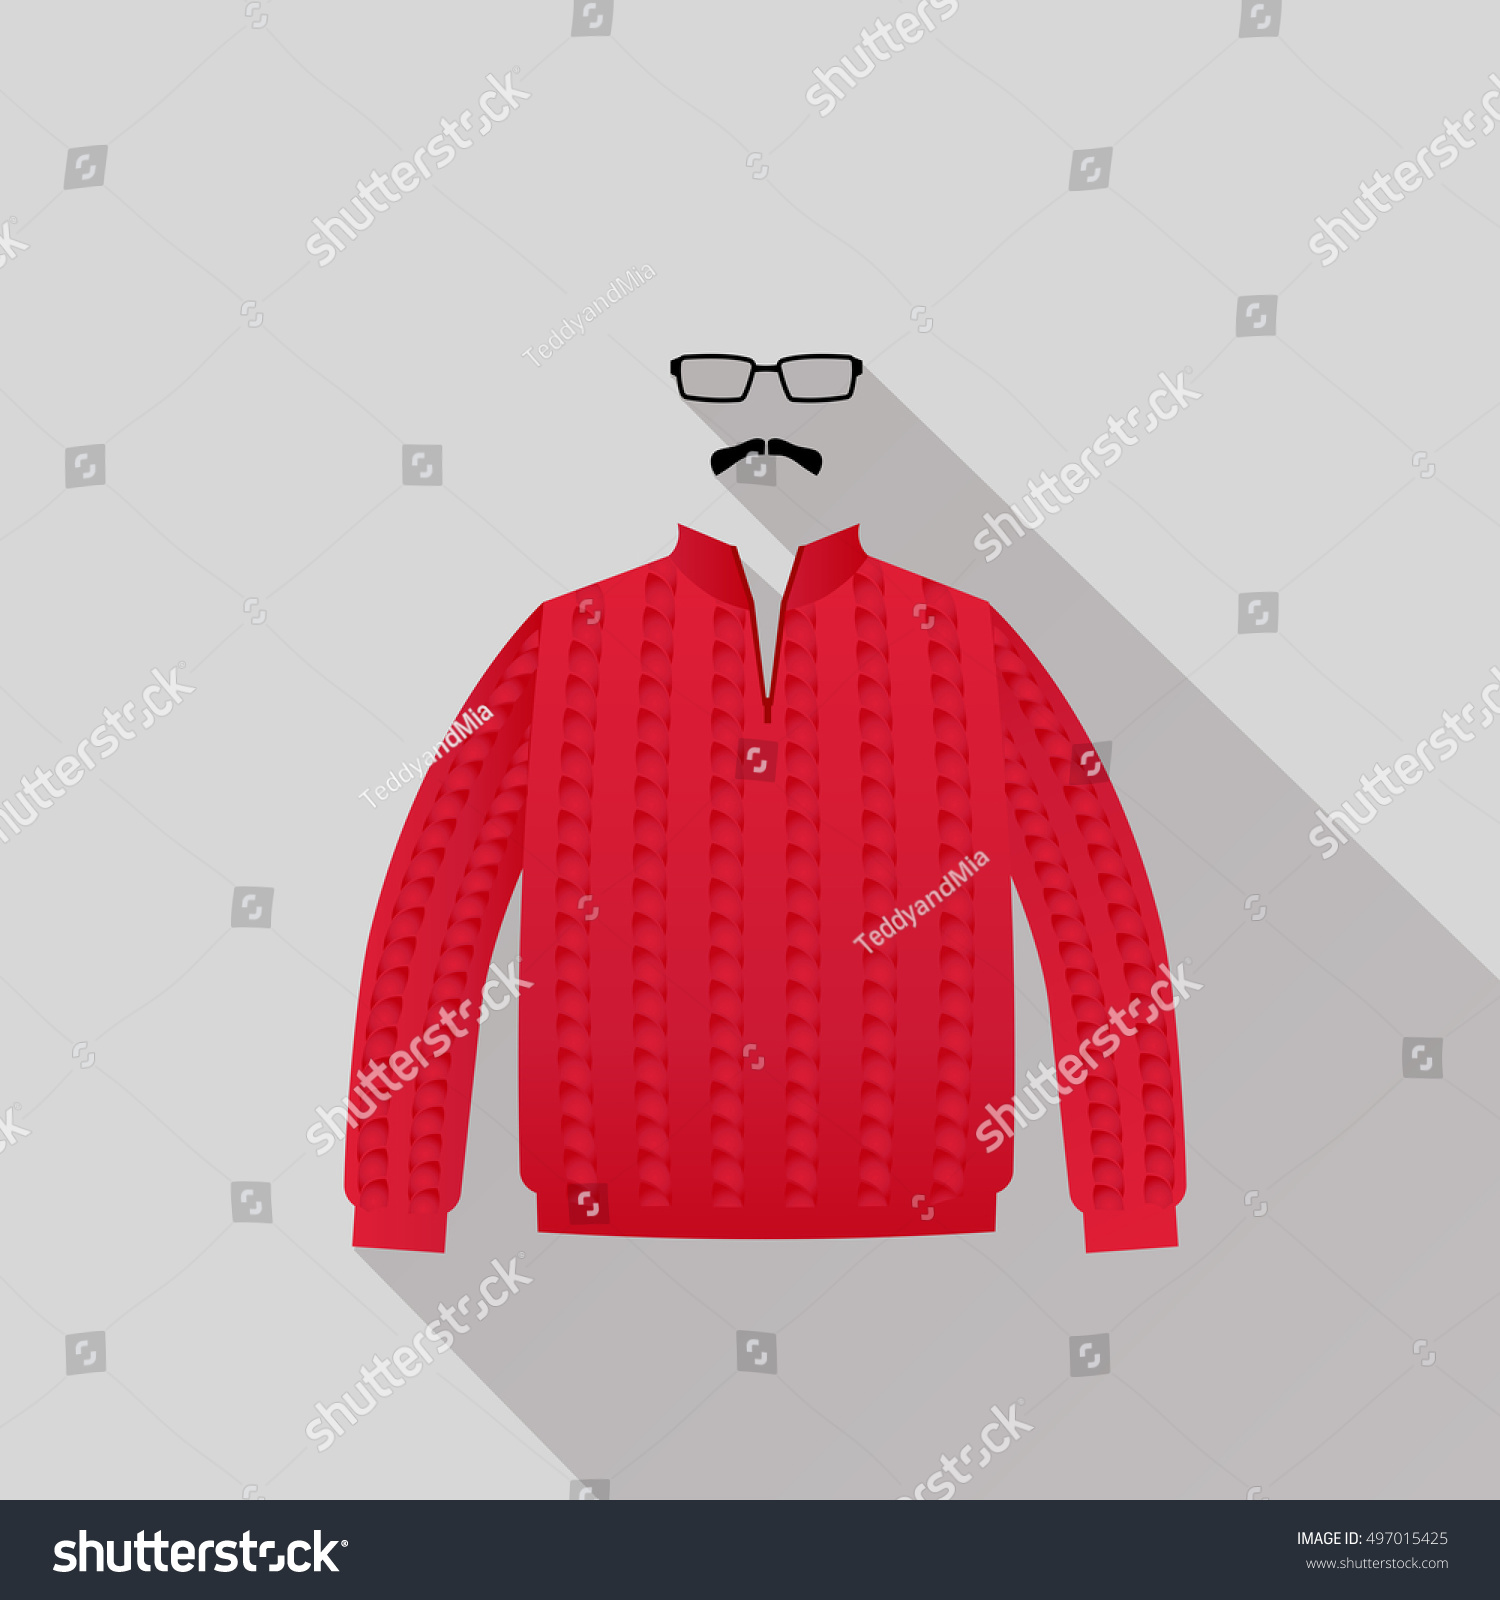 Red Sweater Mustache Eyeglasses Stock Vector 497015425 - Shutterstock